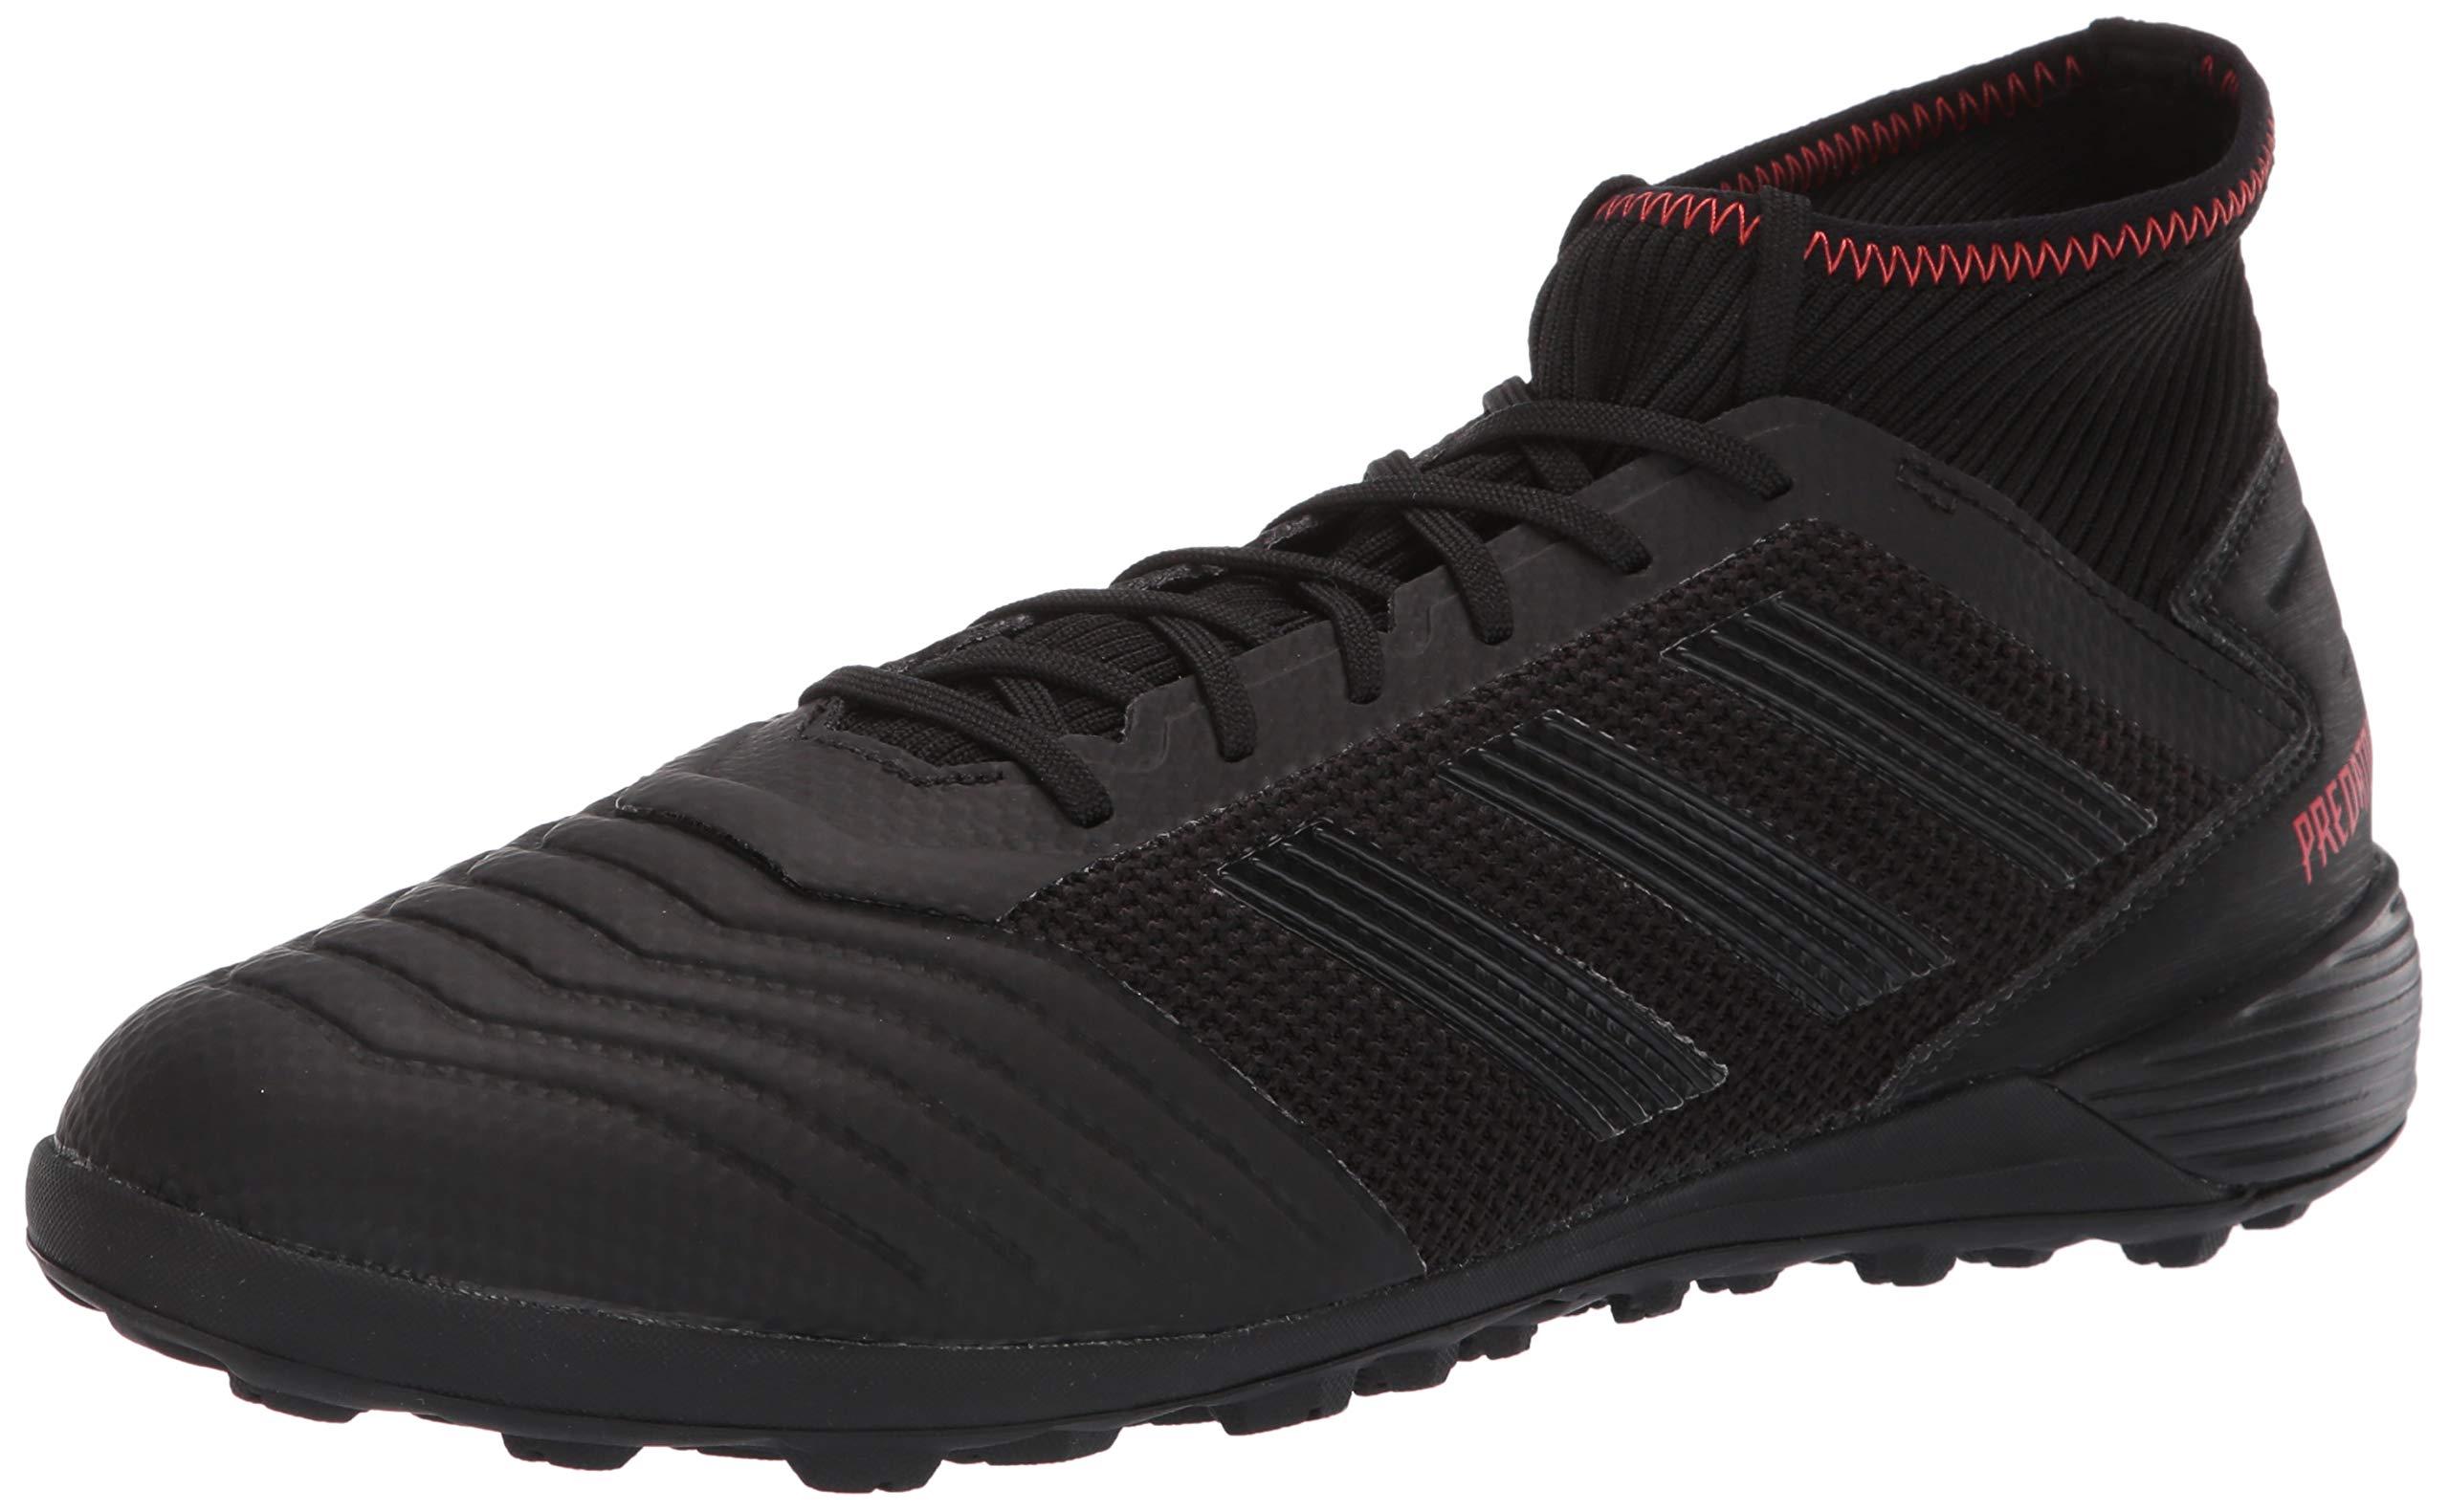 adidas Men's Predator 19.3 TF, Black/Active red, 11 M US by adidas